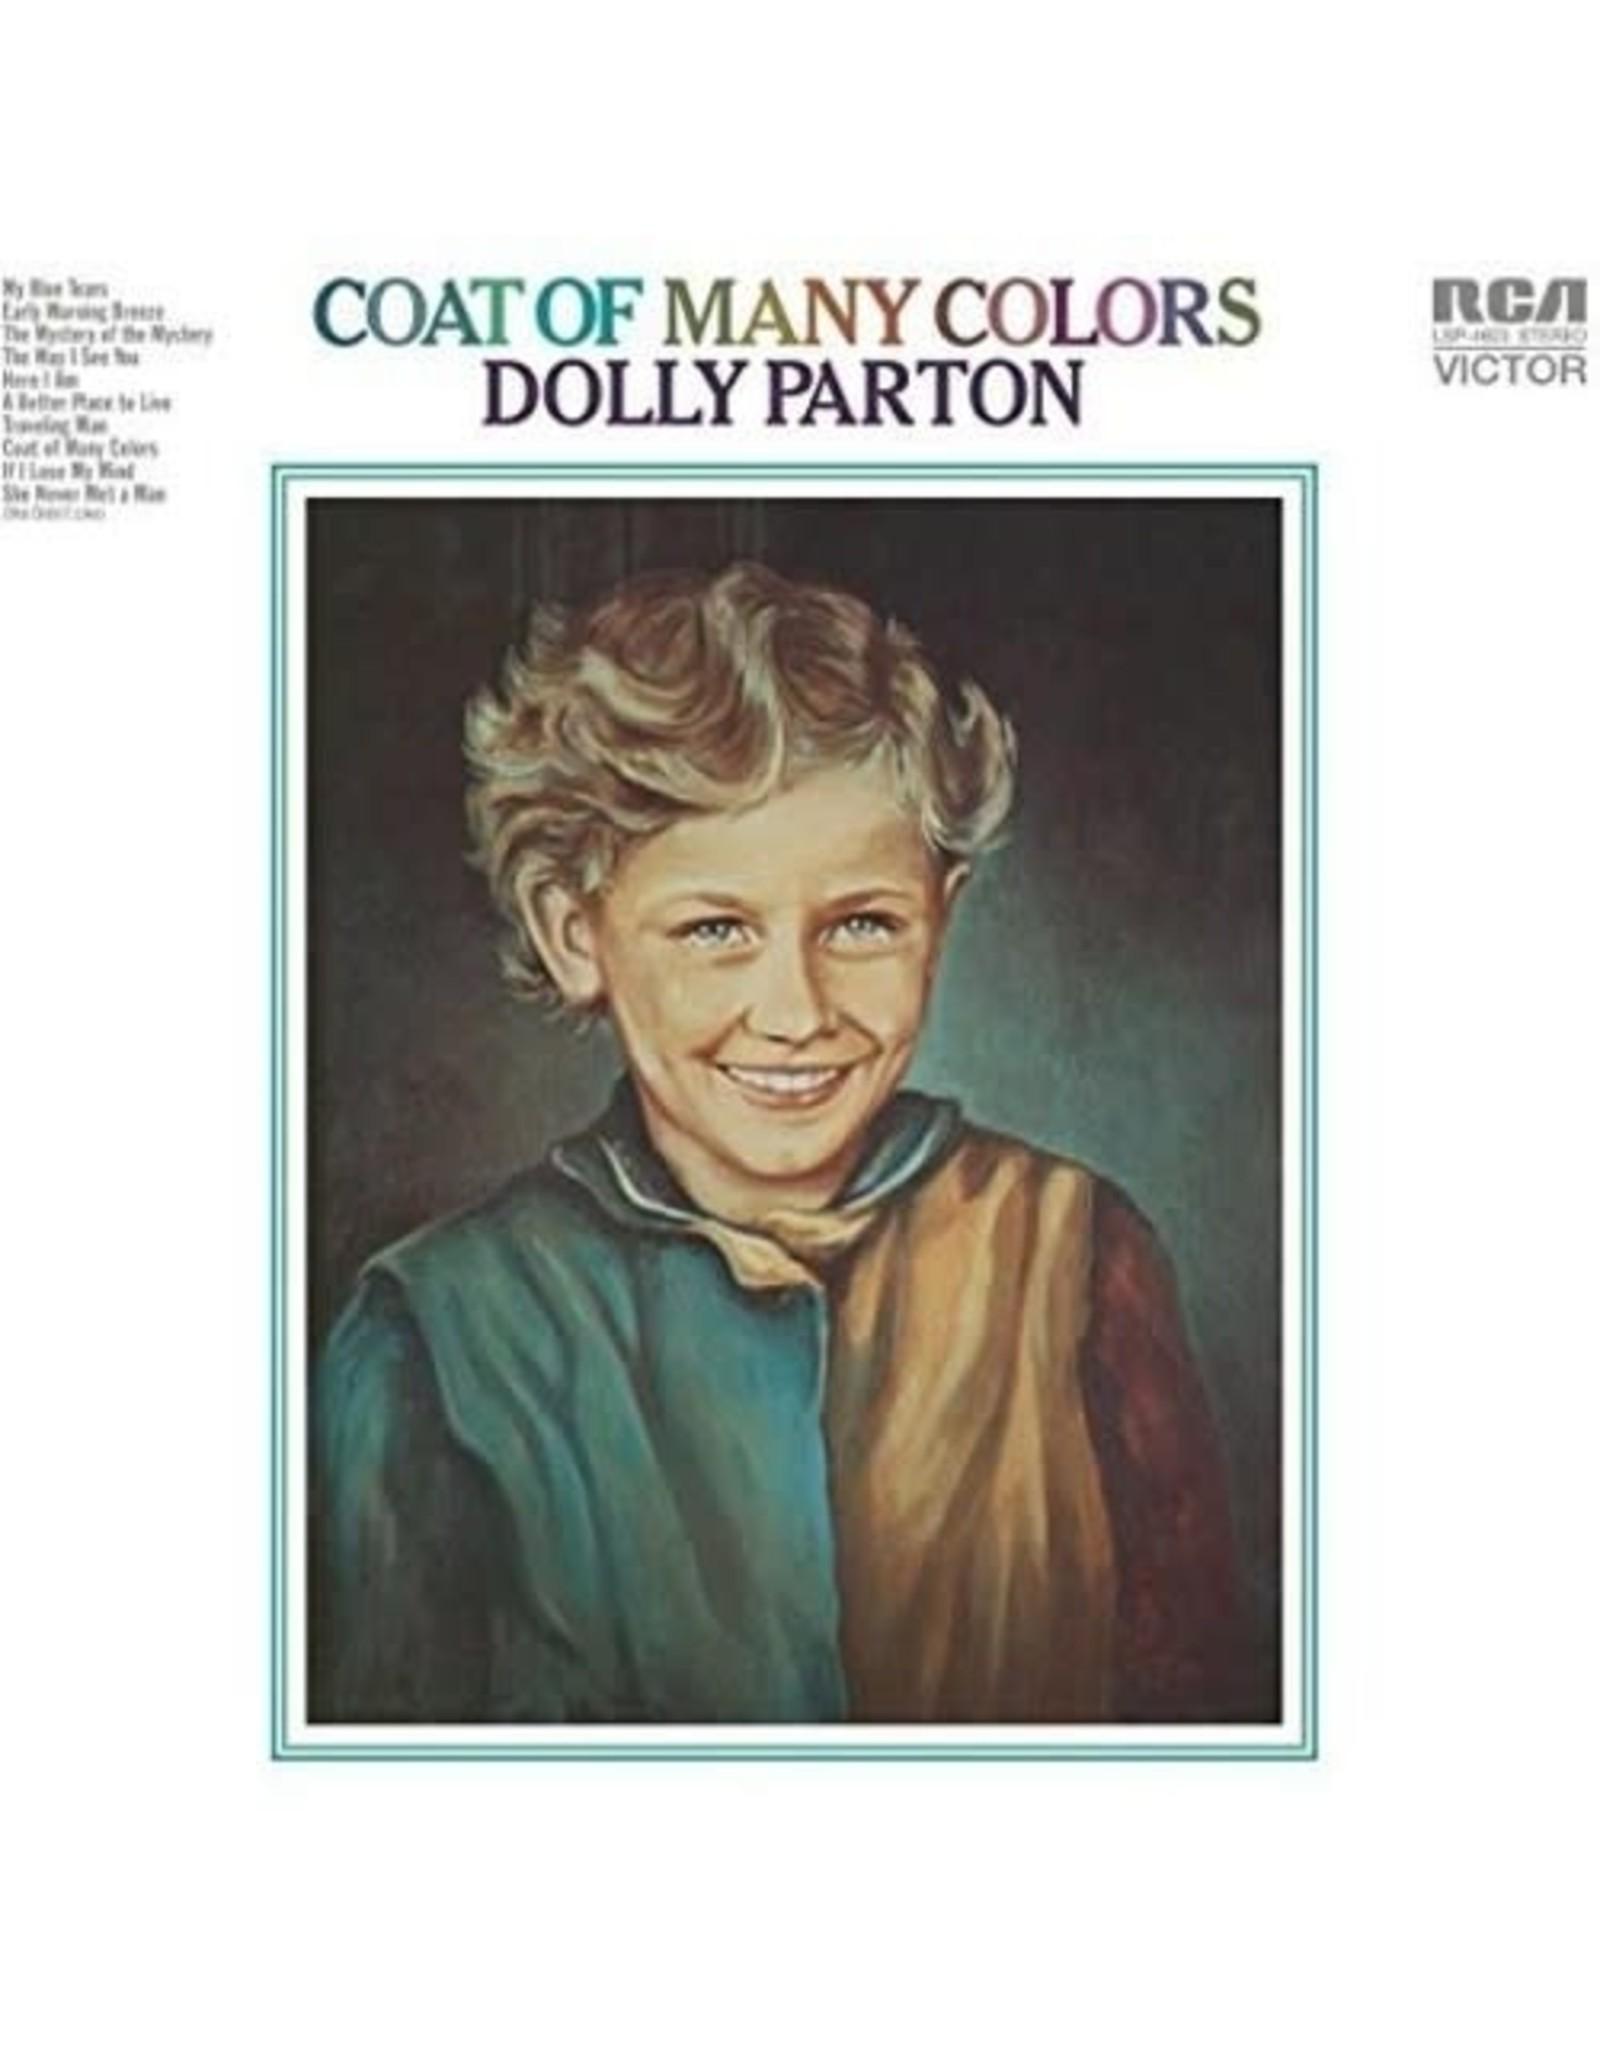 New Vinyl Dolly Parton - Coat of Many Colors [Import] LP